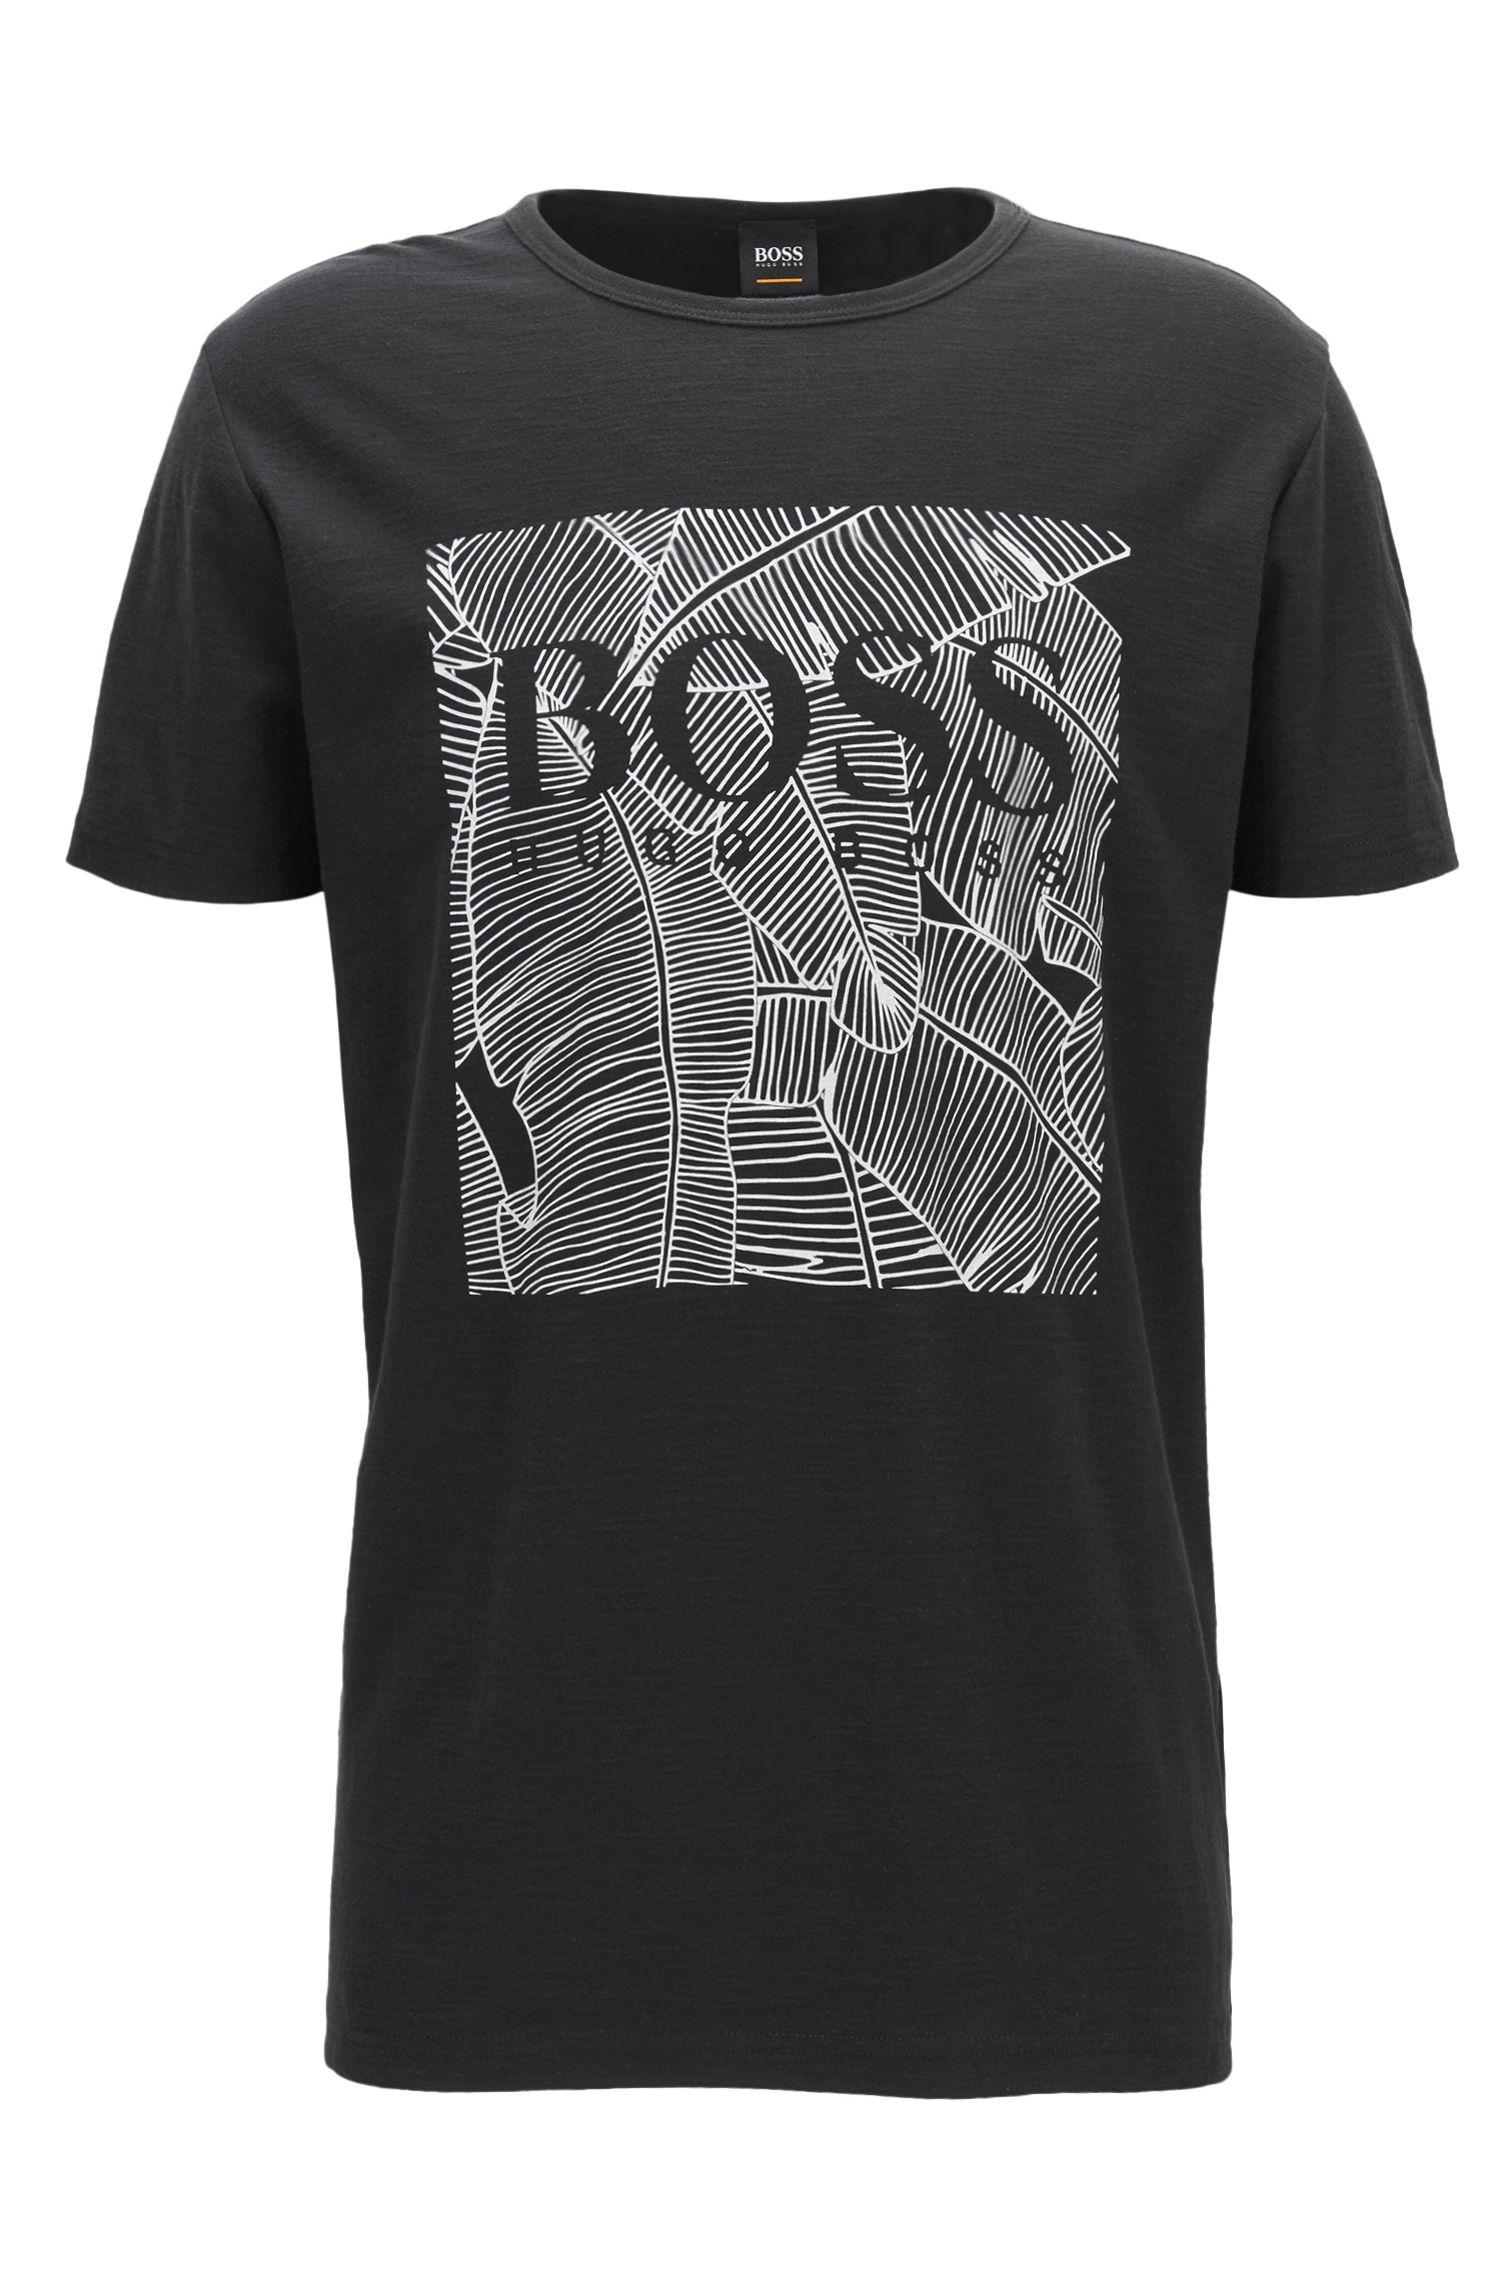 Leaf-Print Cotton Graphic T-Shirt | Tarit